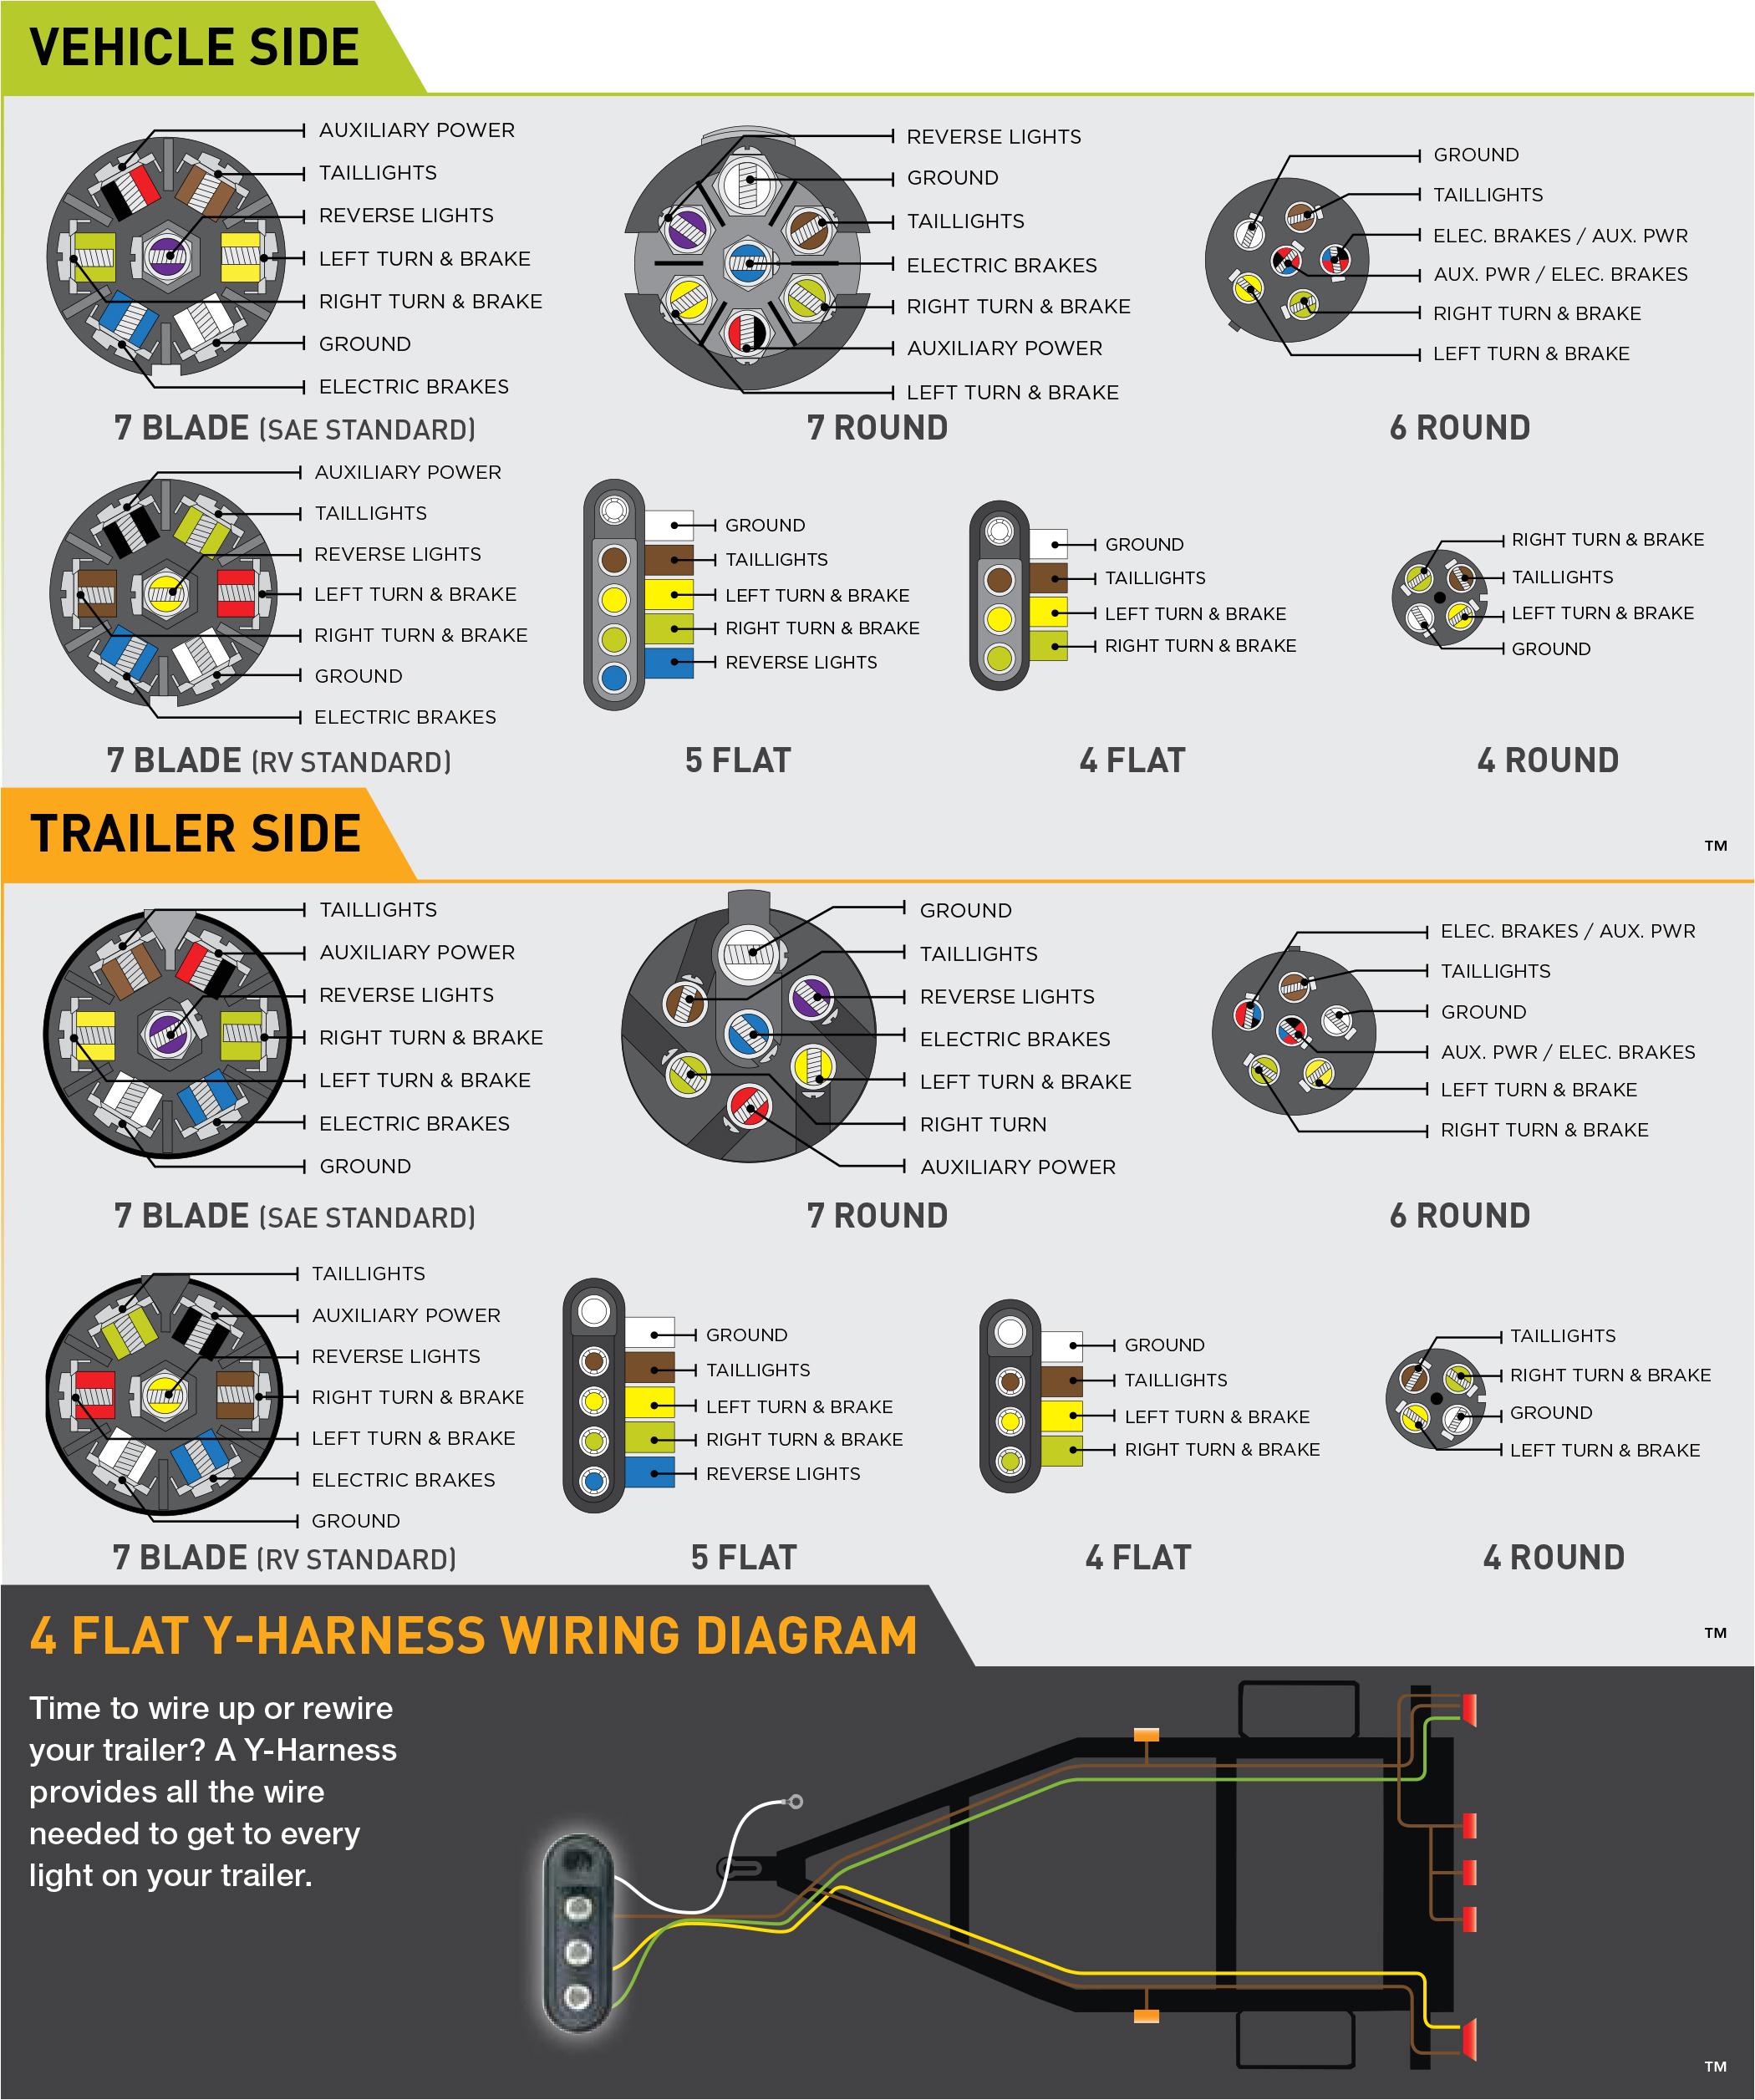 5 round wire diagram manual e book6 pole round wiring diagram 20